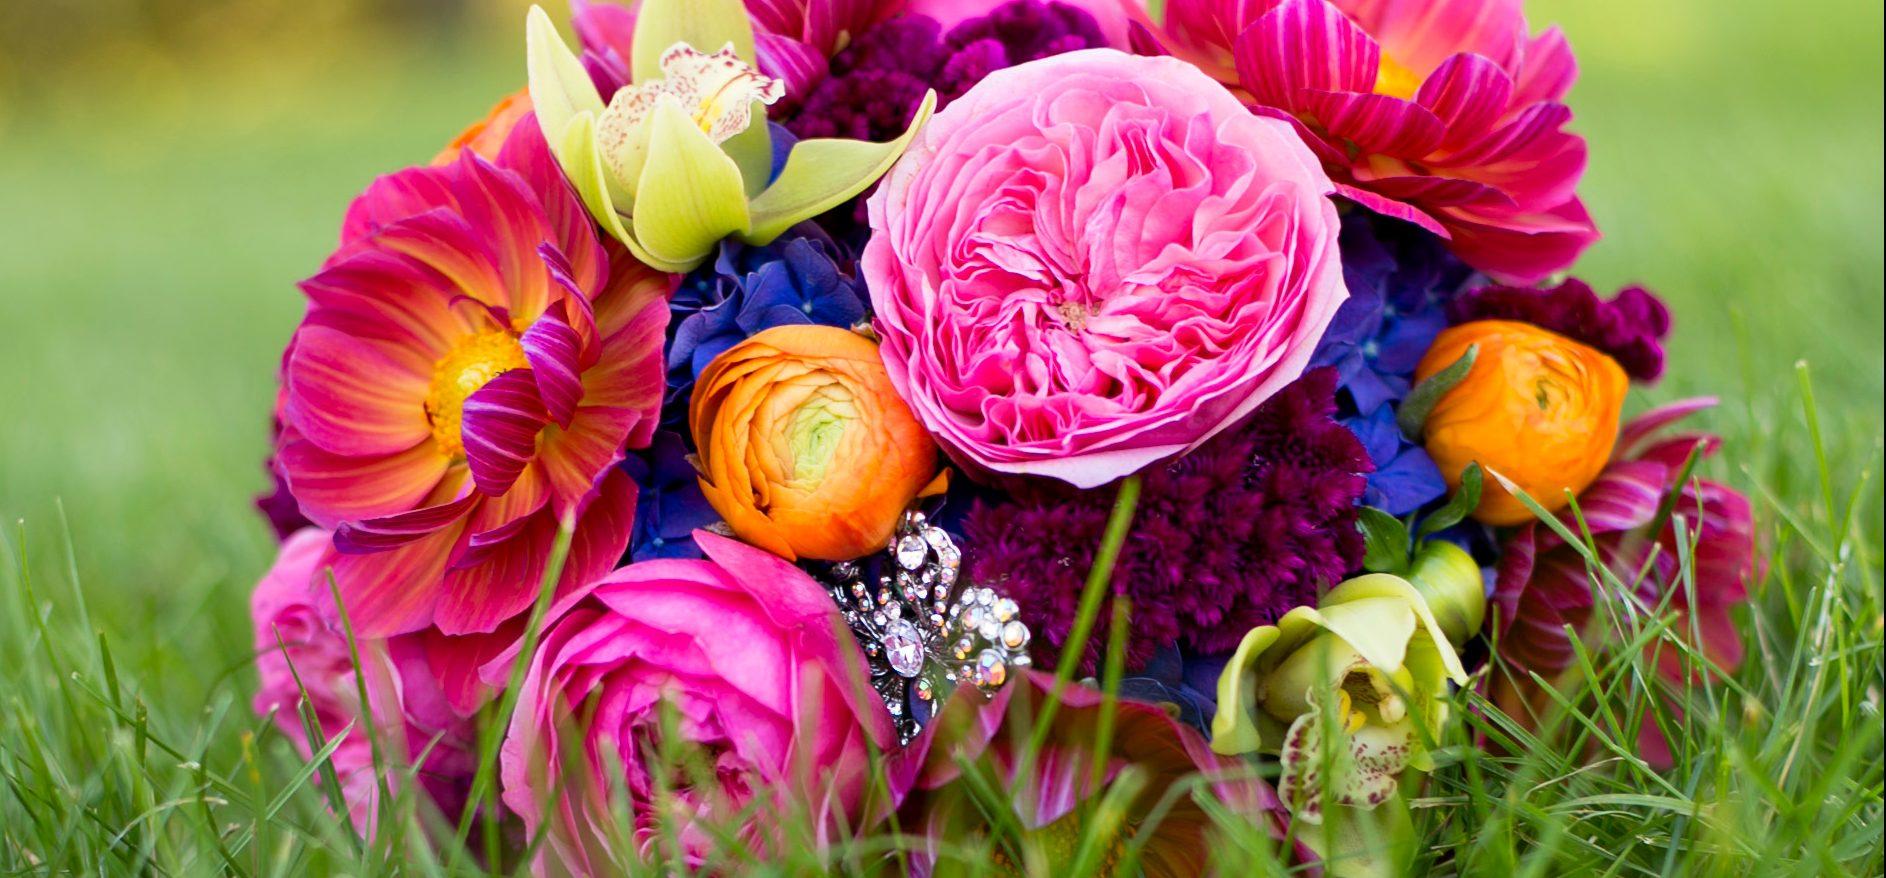 Fleur De Lis Weddings – Exquisite Weddings, Spectacular Flowers